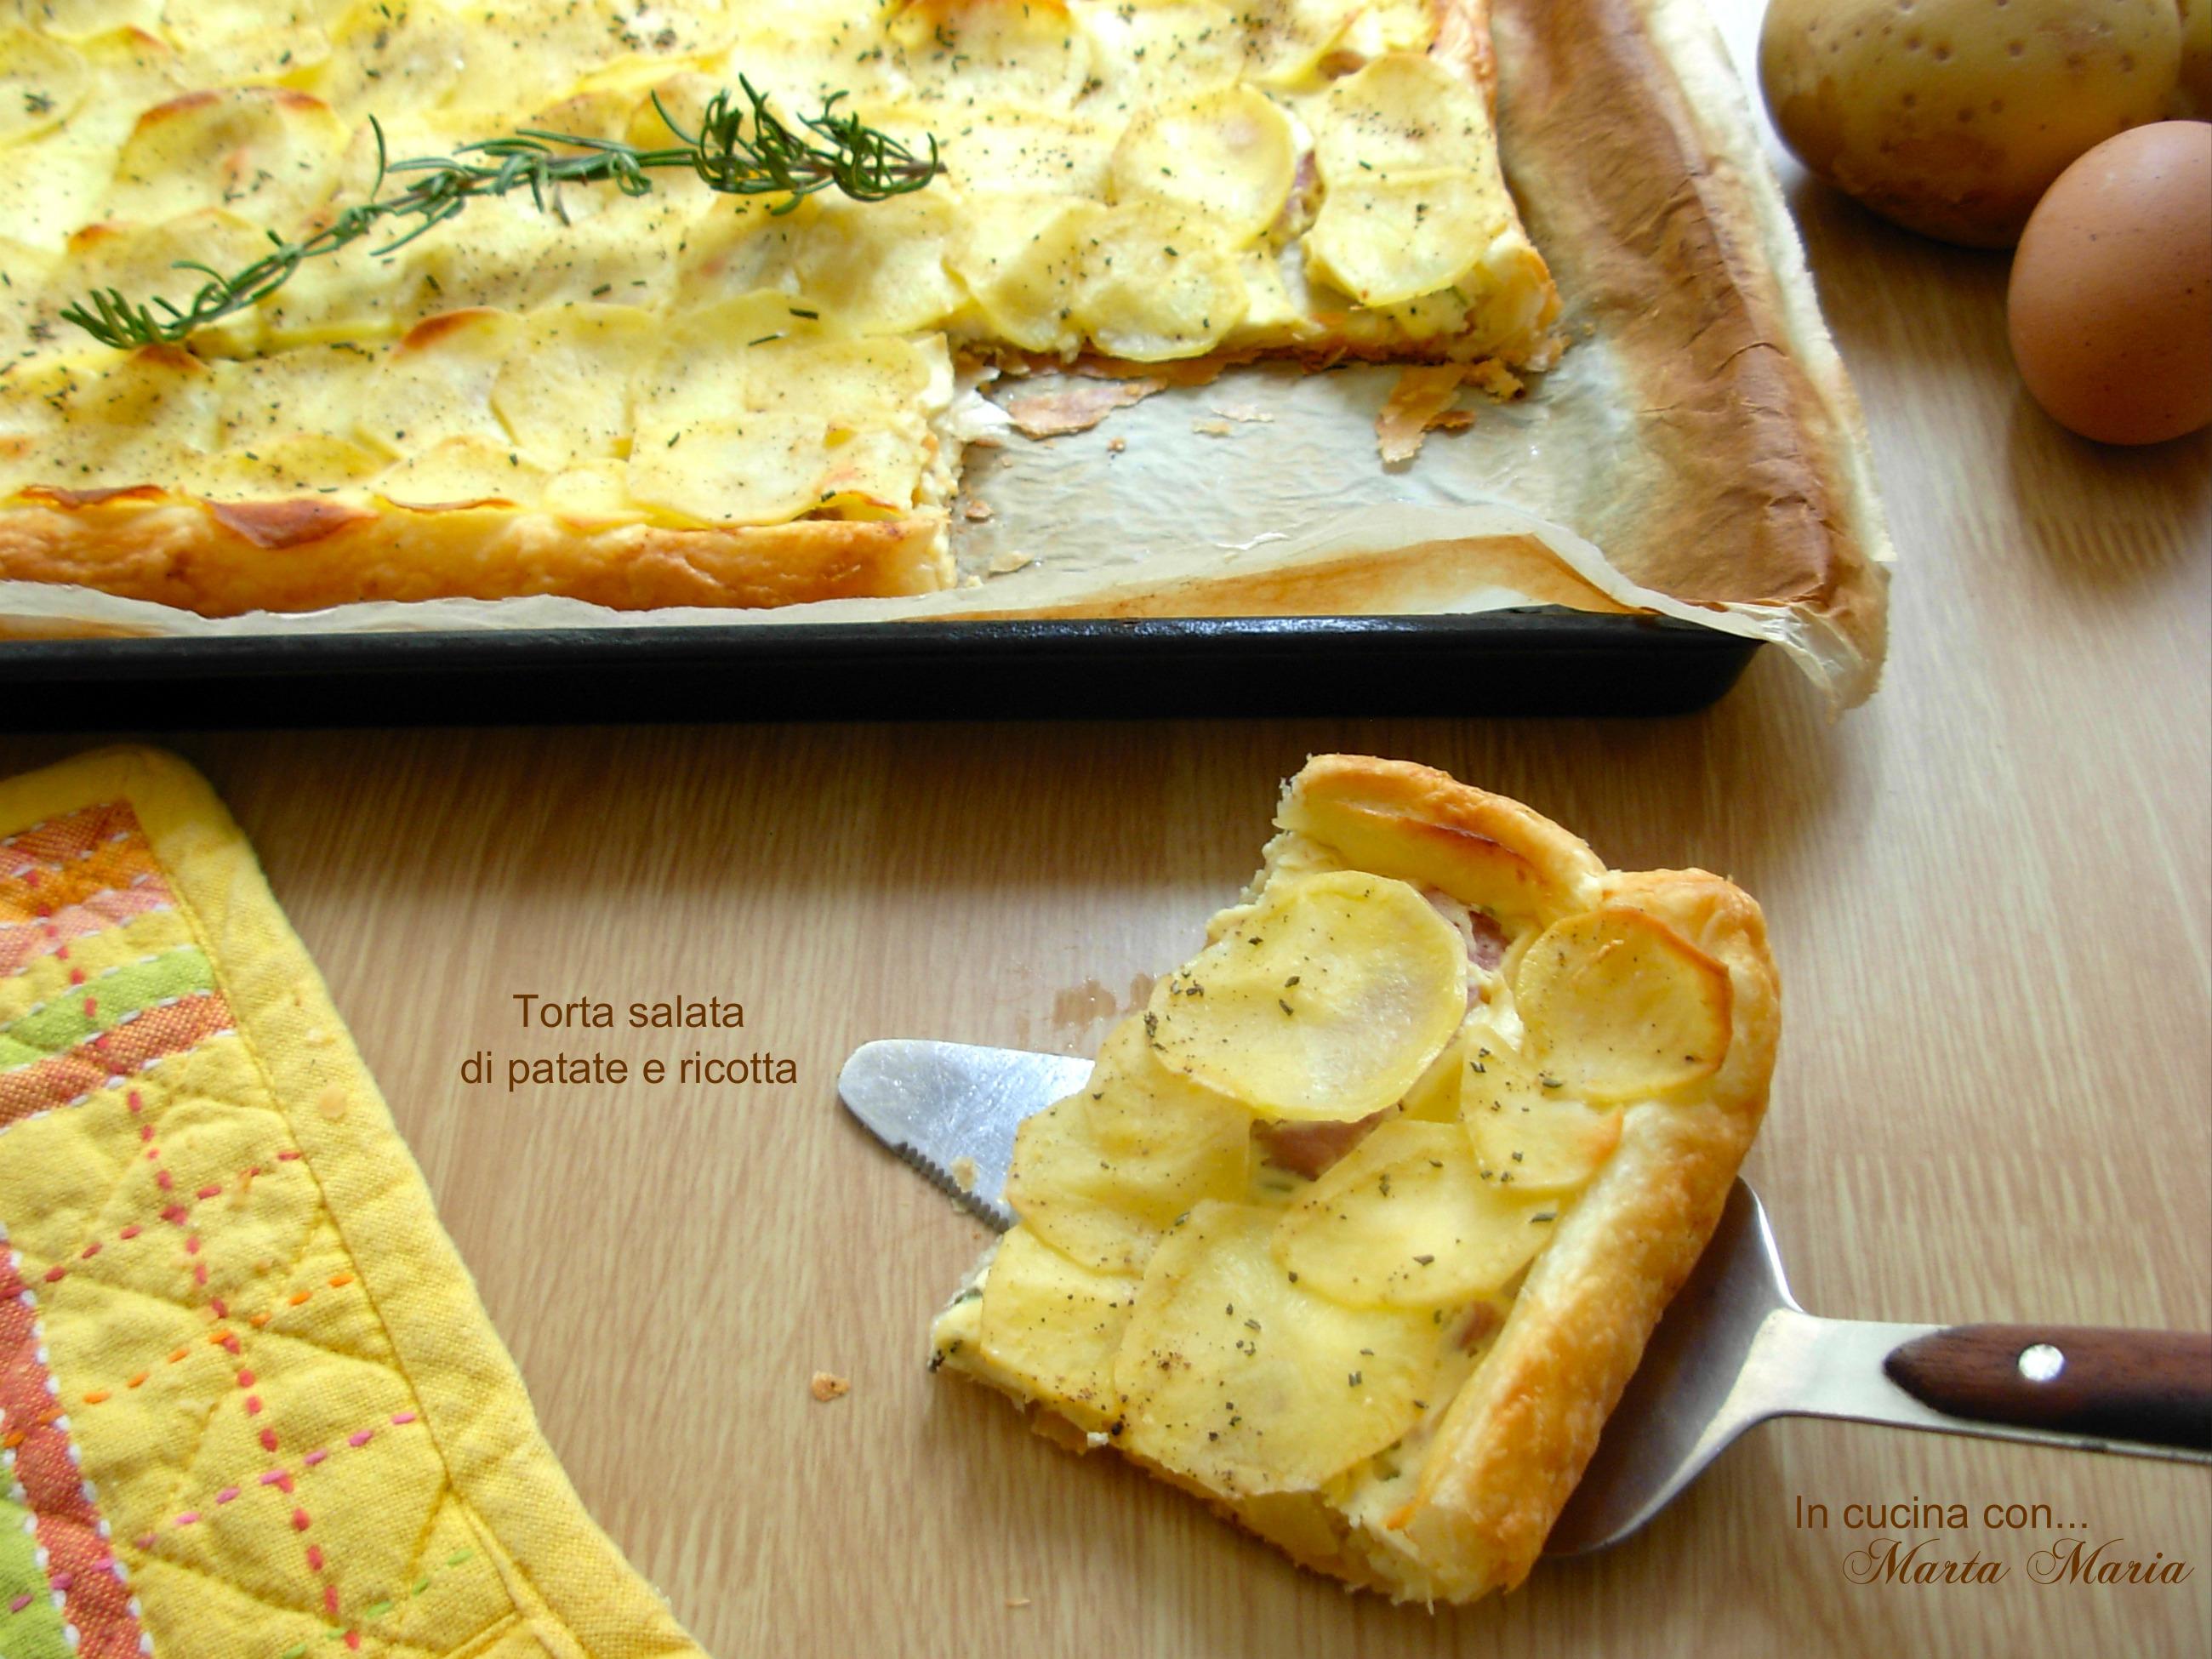 TORTA SALATA DI PATATE E RICOTTA, ricetta facile